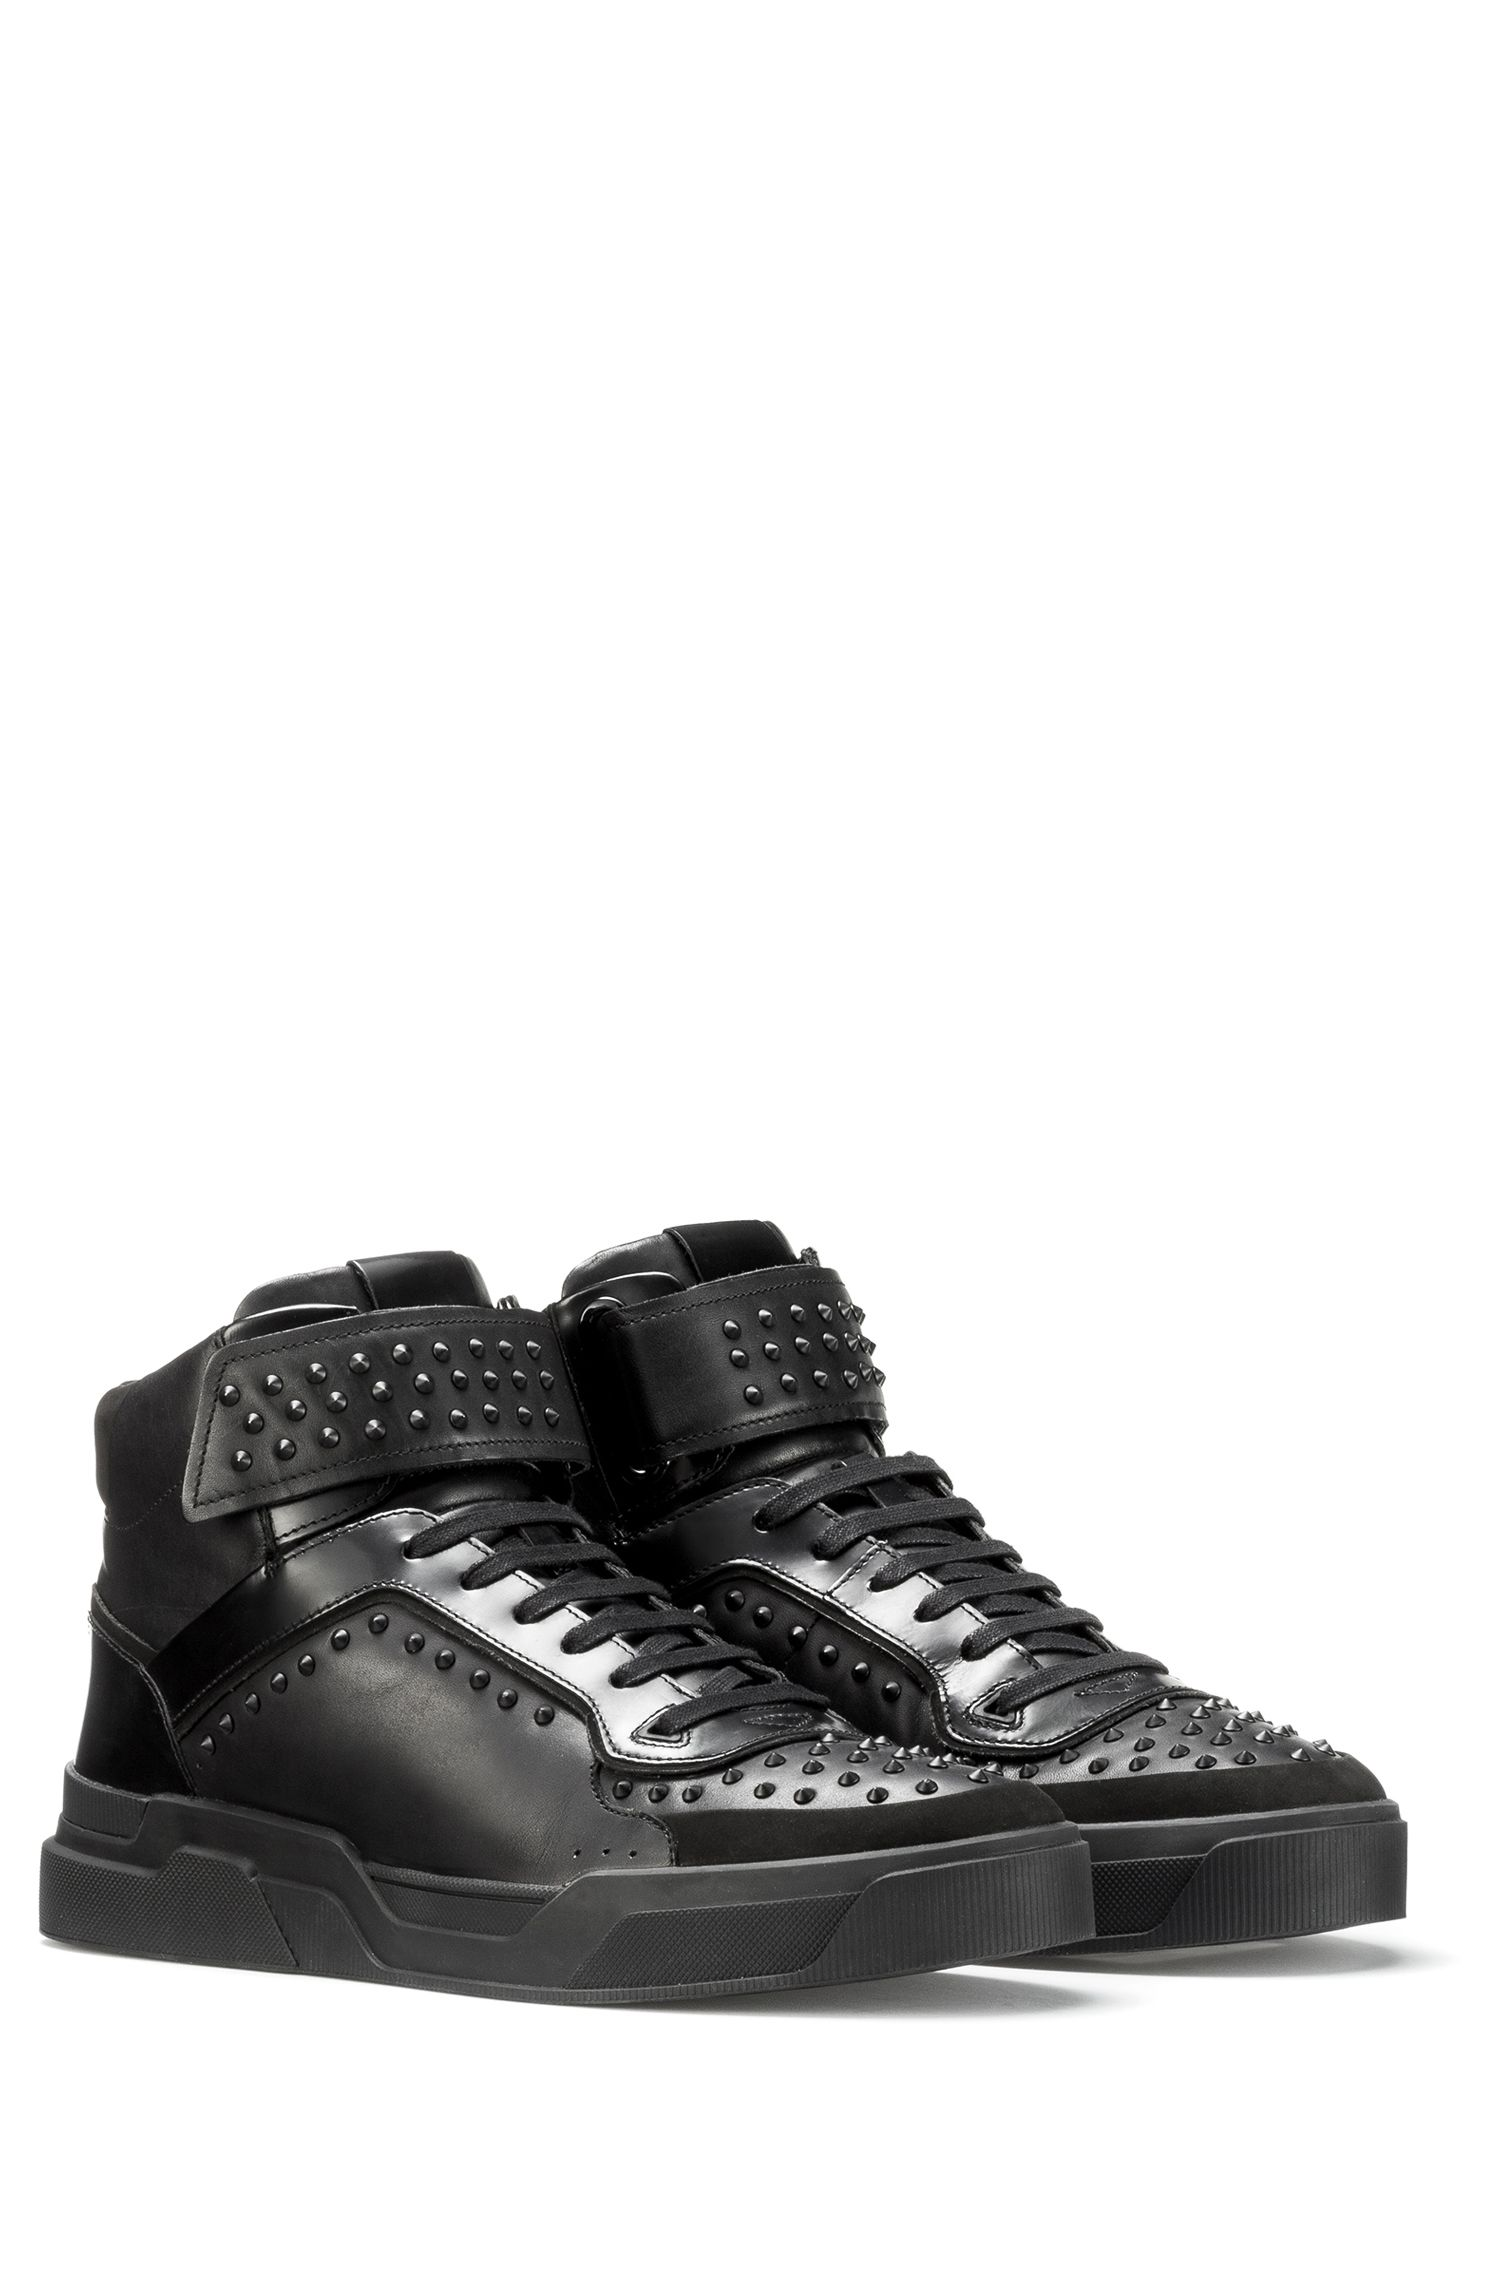 Sneakers high-top in pelle nappa con borchie